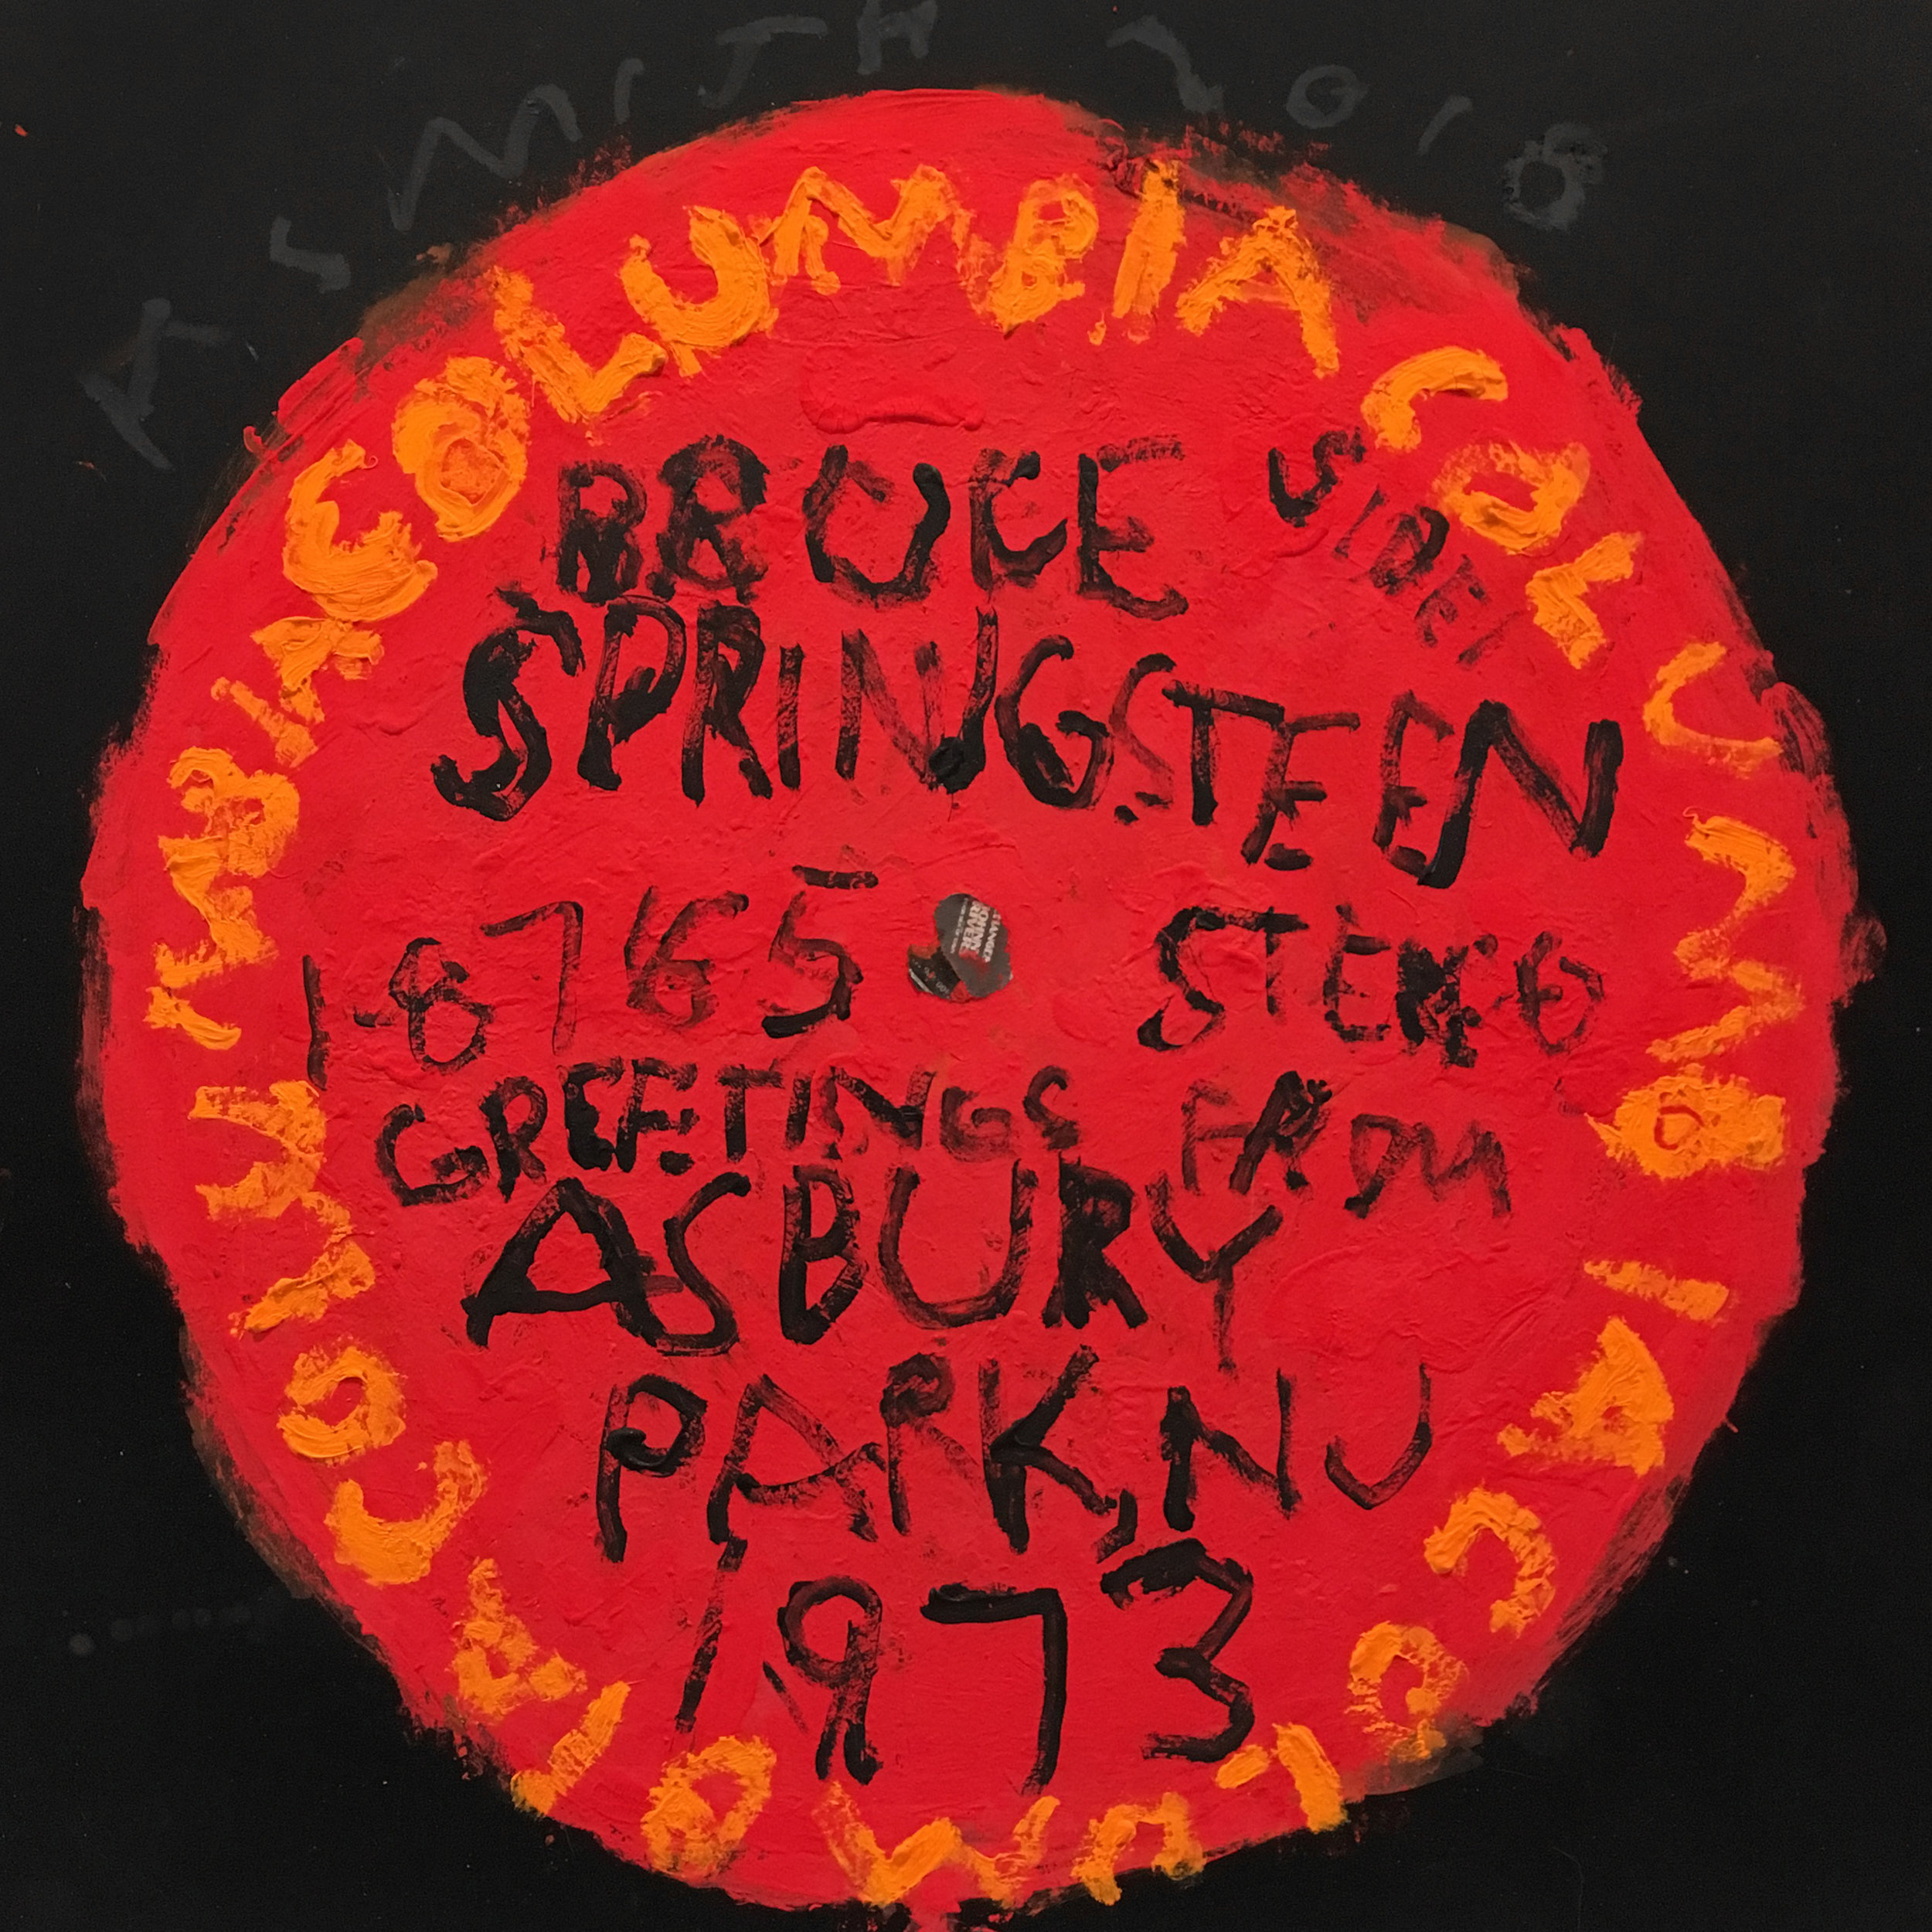 Bruce Springsteen / Greetings from Asbury Park, NJ